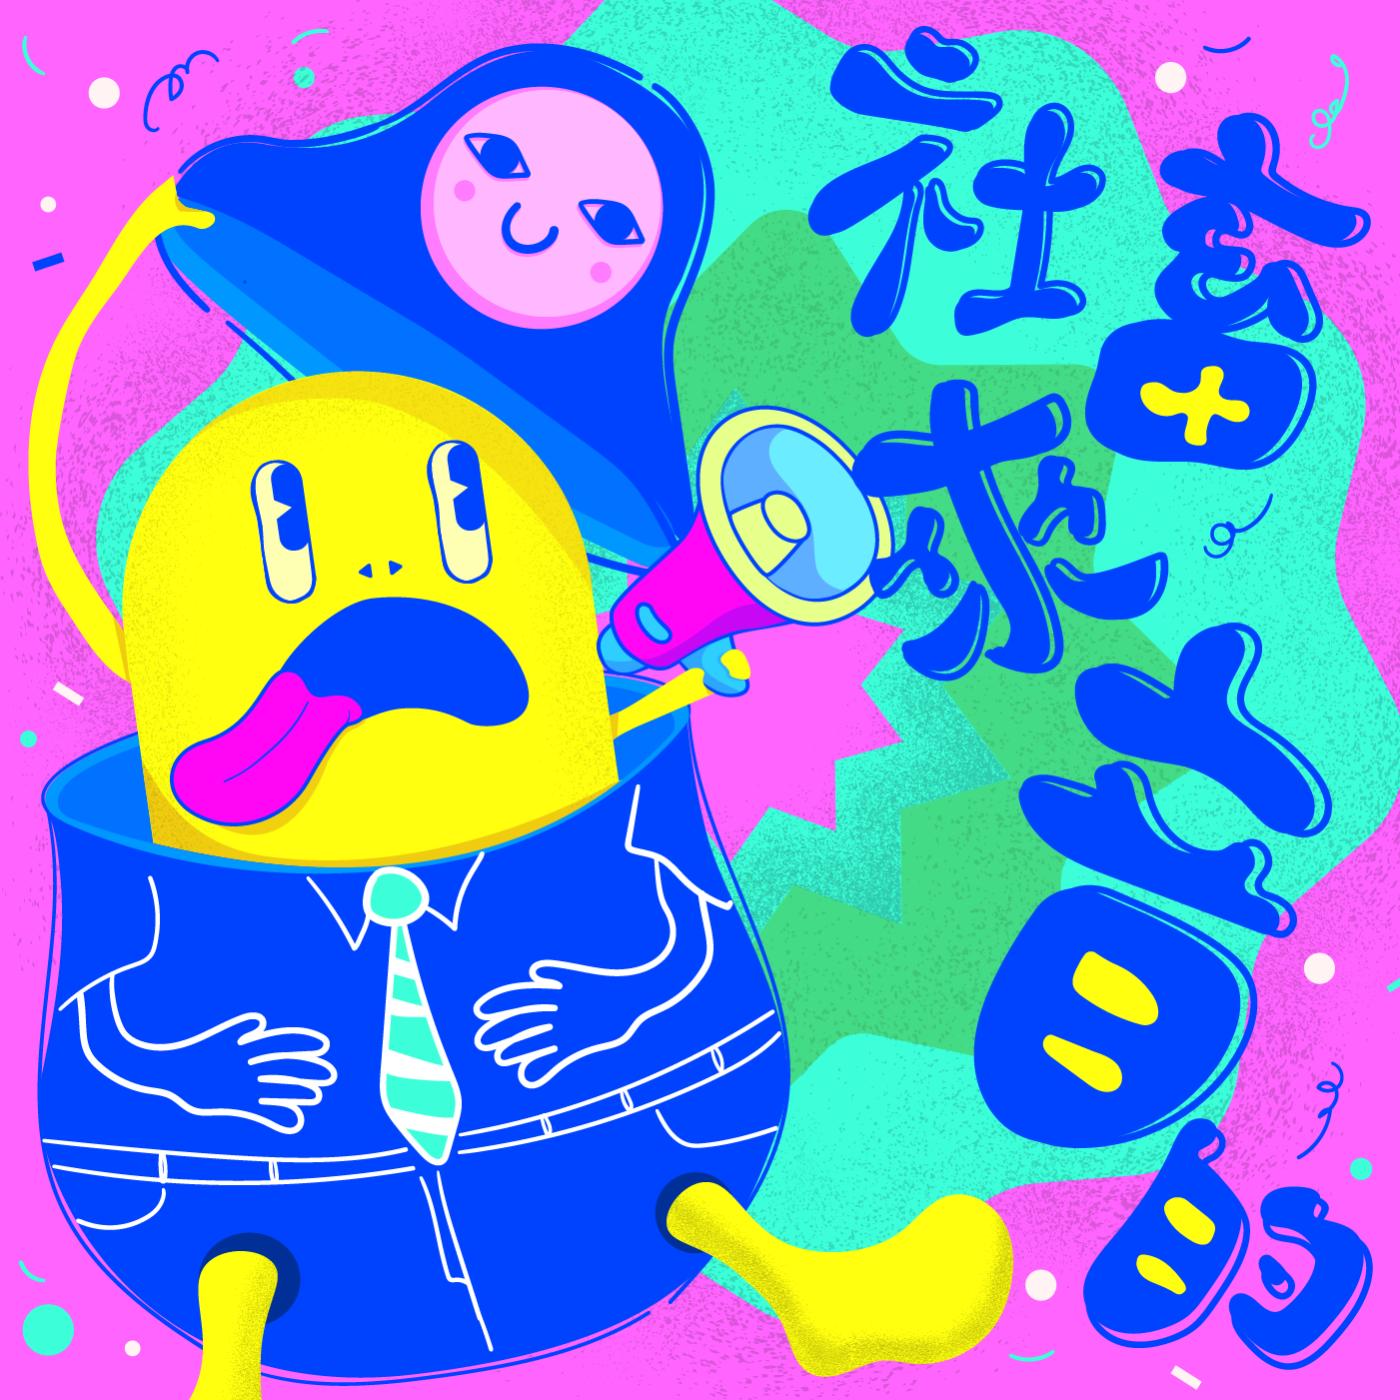 EP2 音樂產業鏈之謎,夢想可以當飯吃嗎? feat. 宣傳秋